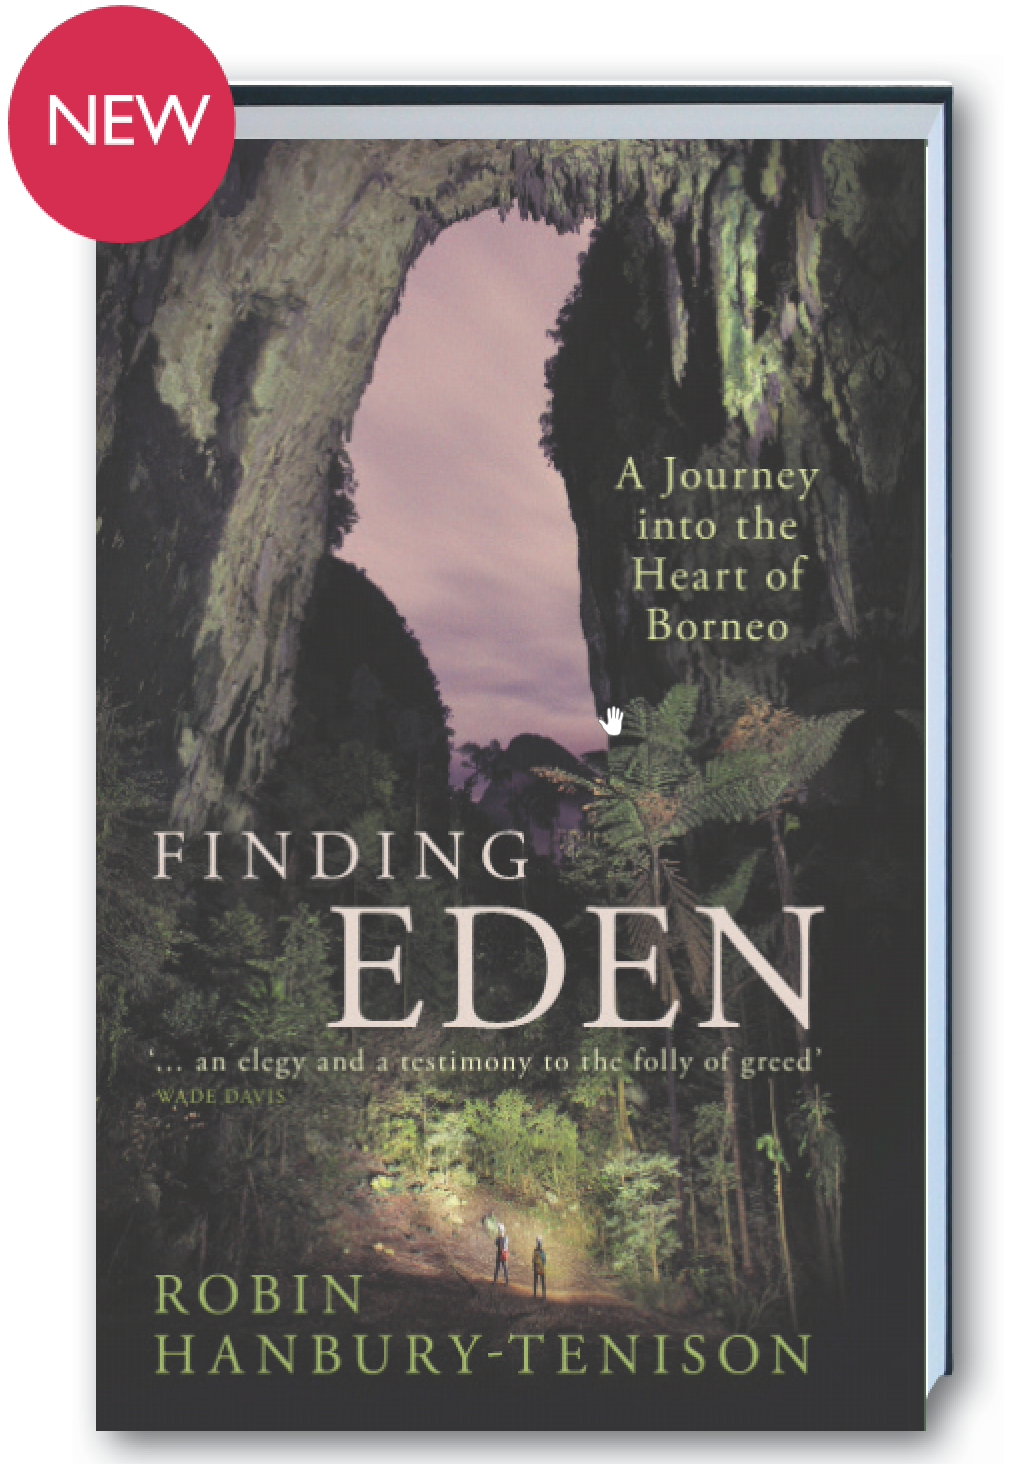 NEW BOOK FINDING EDEN